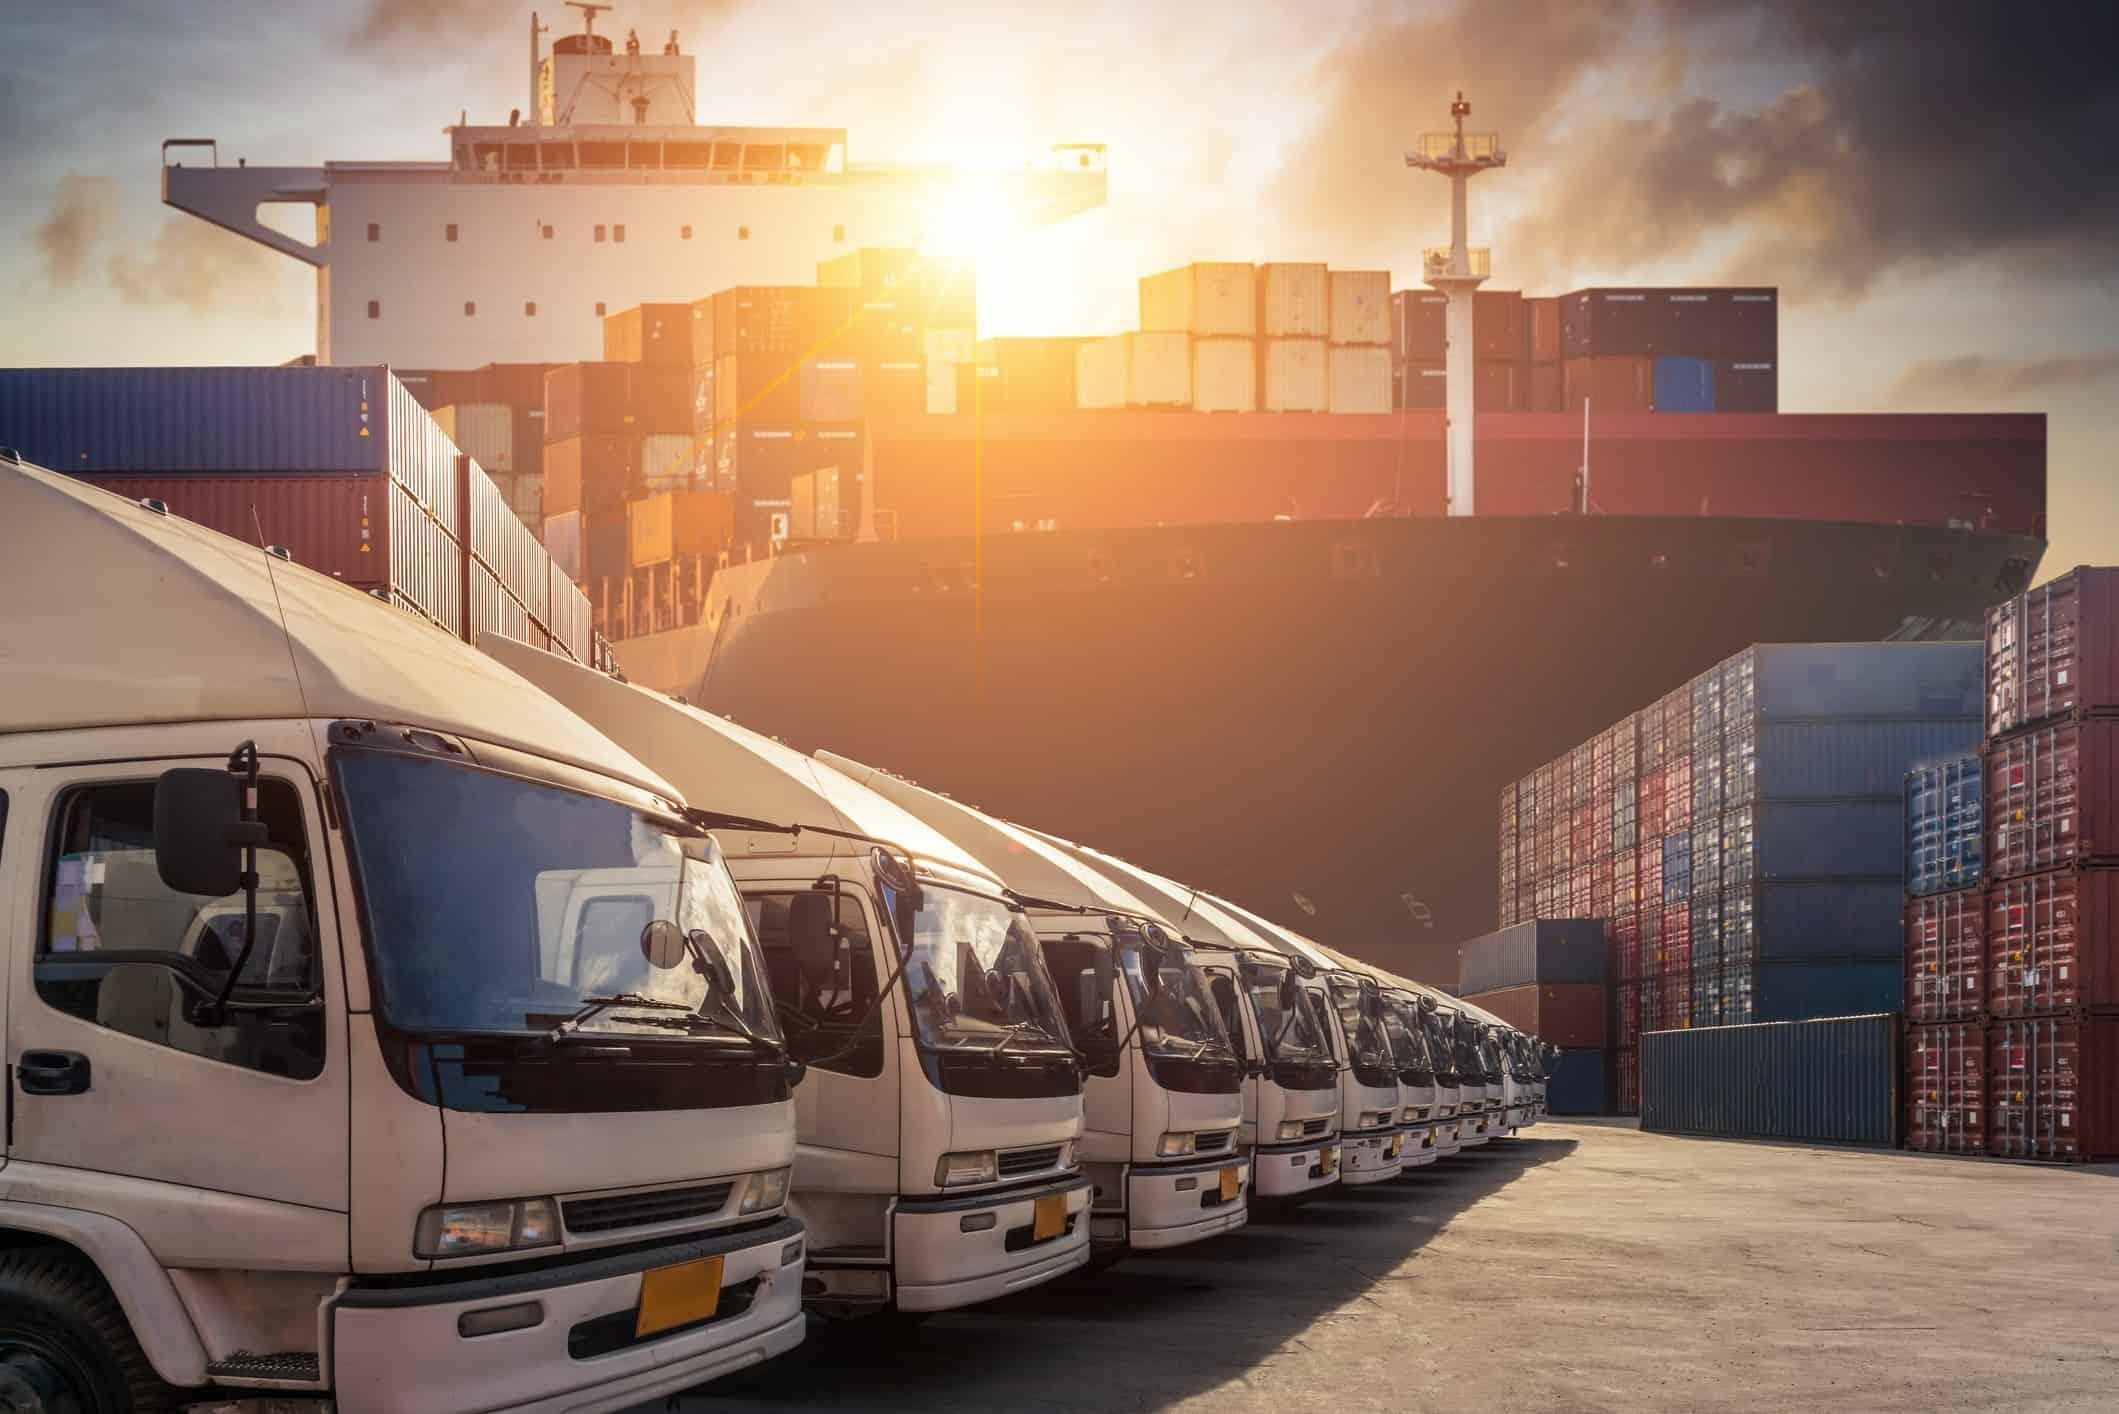 Retail-consumer-goods-ground-shipping-ocean-transport